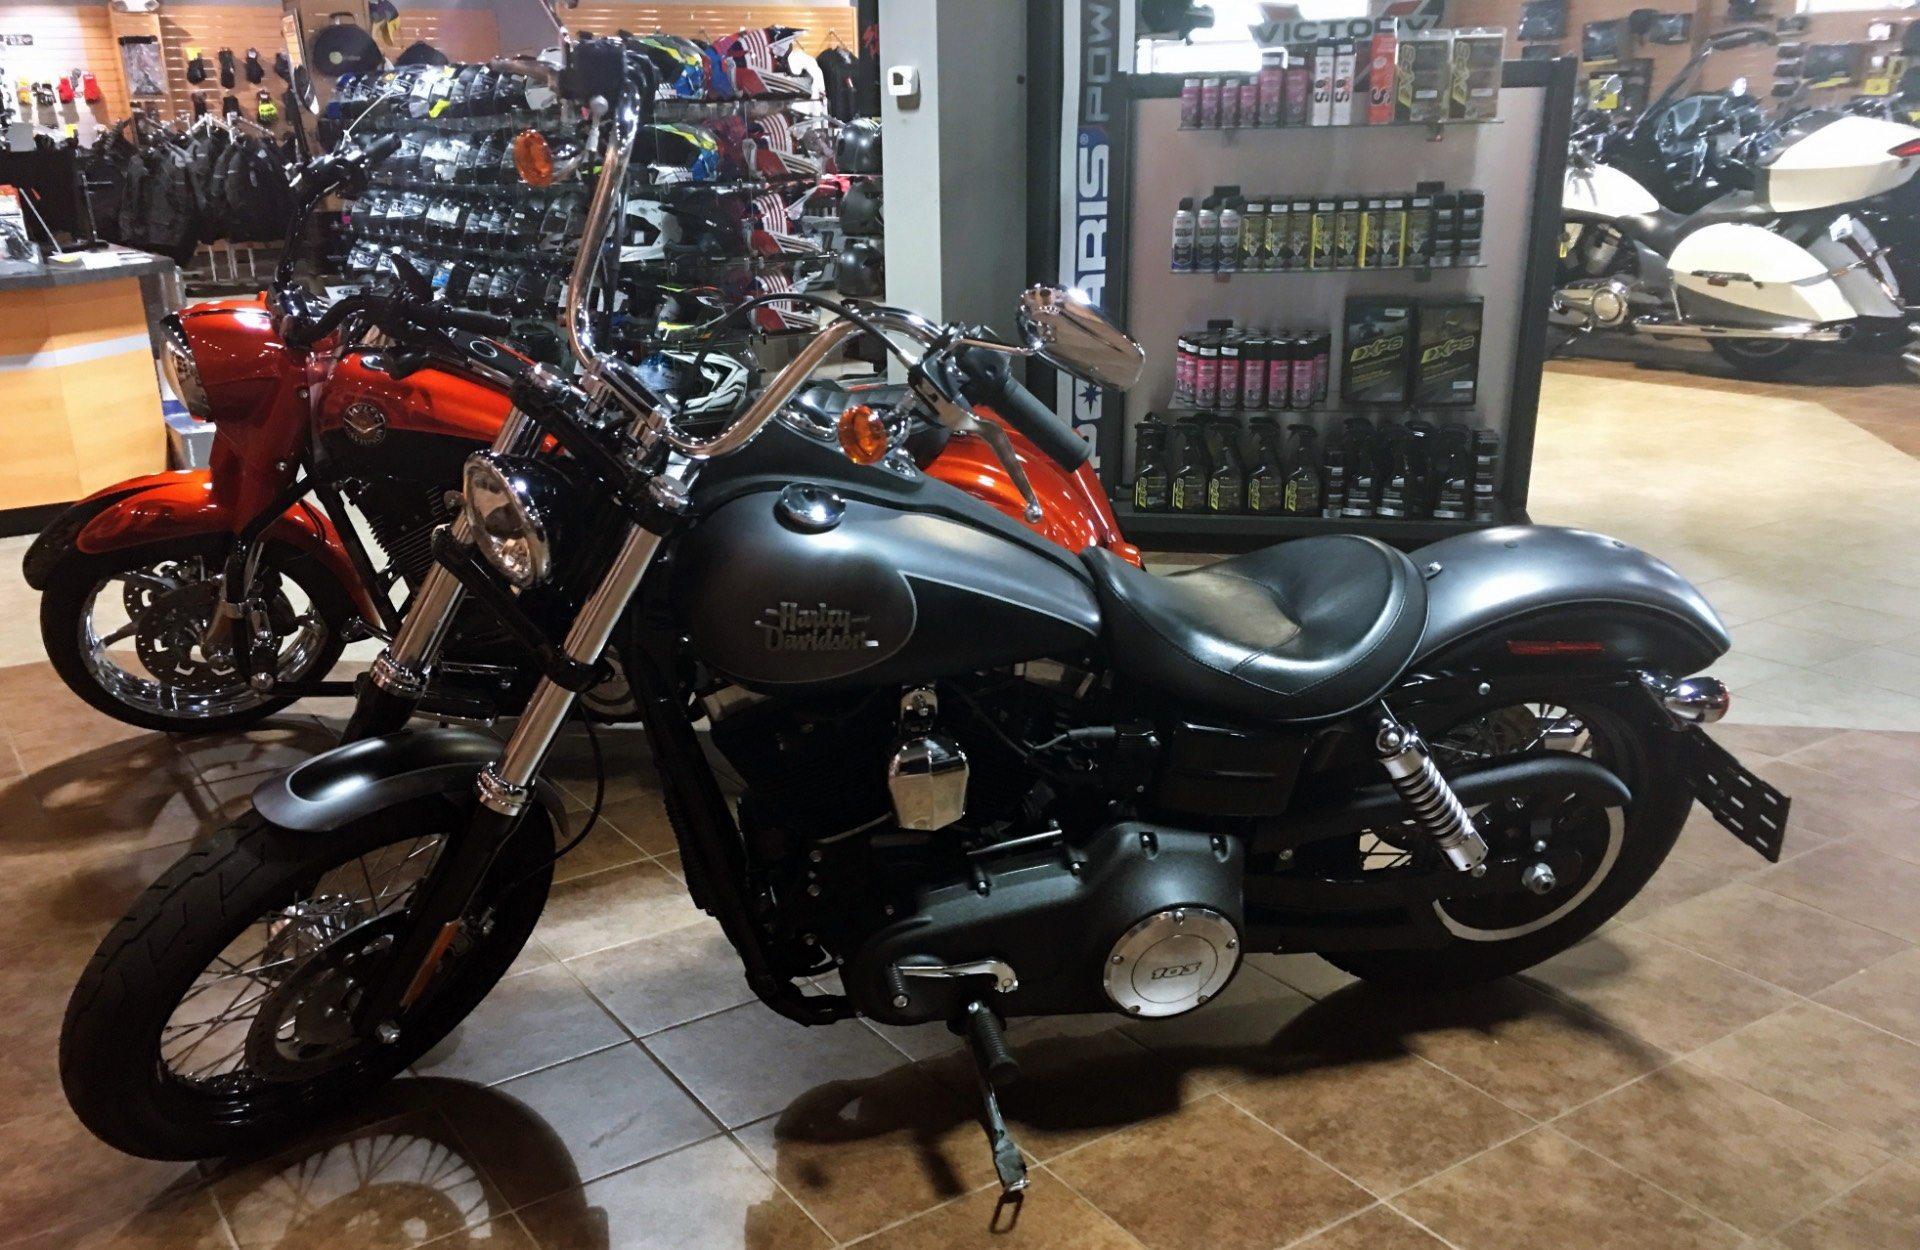 2017 harley davidson dyna street bob. 2017 Harley-Davidson Dyna Street Bob In Barre, Massachusetts Harley Davidson